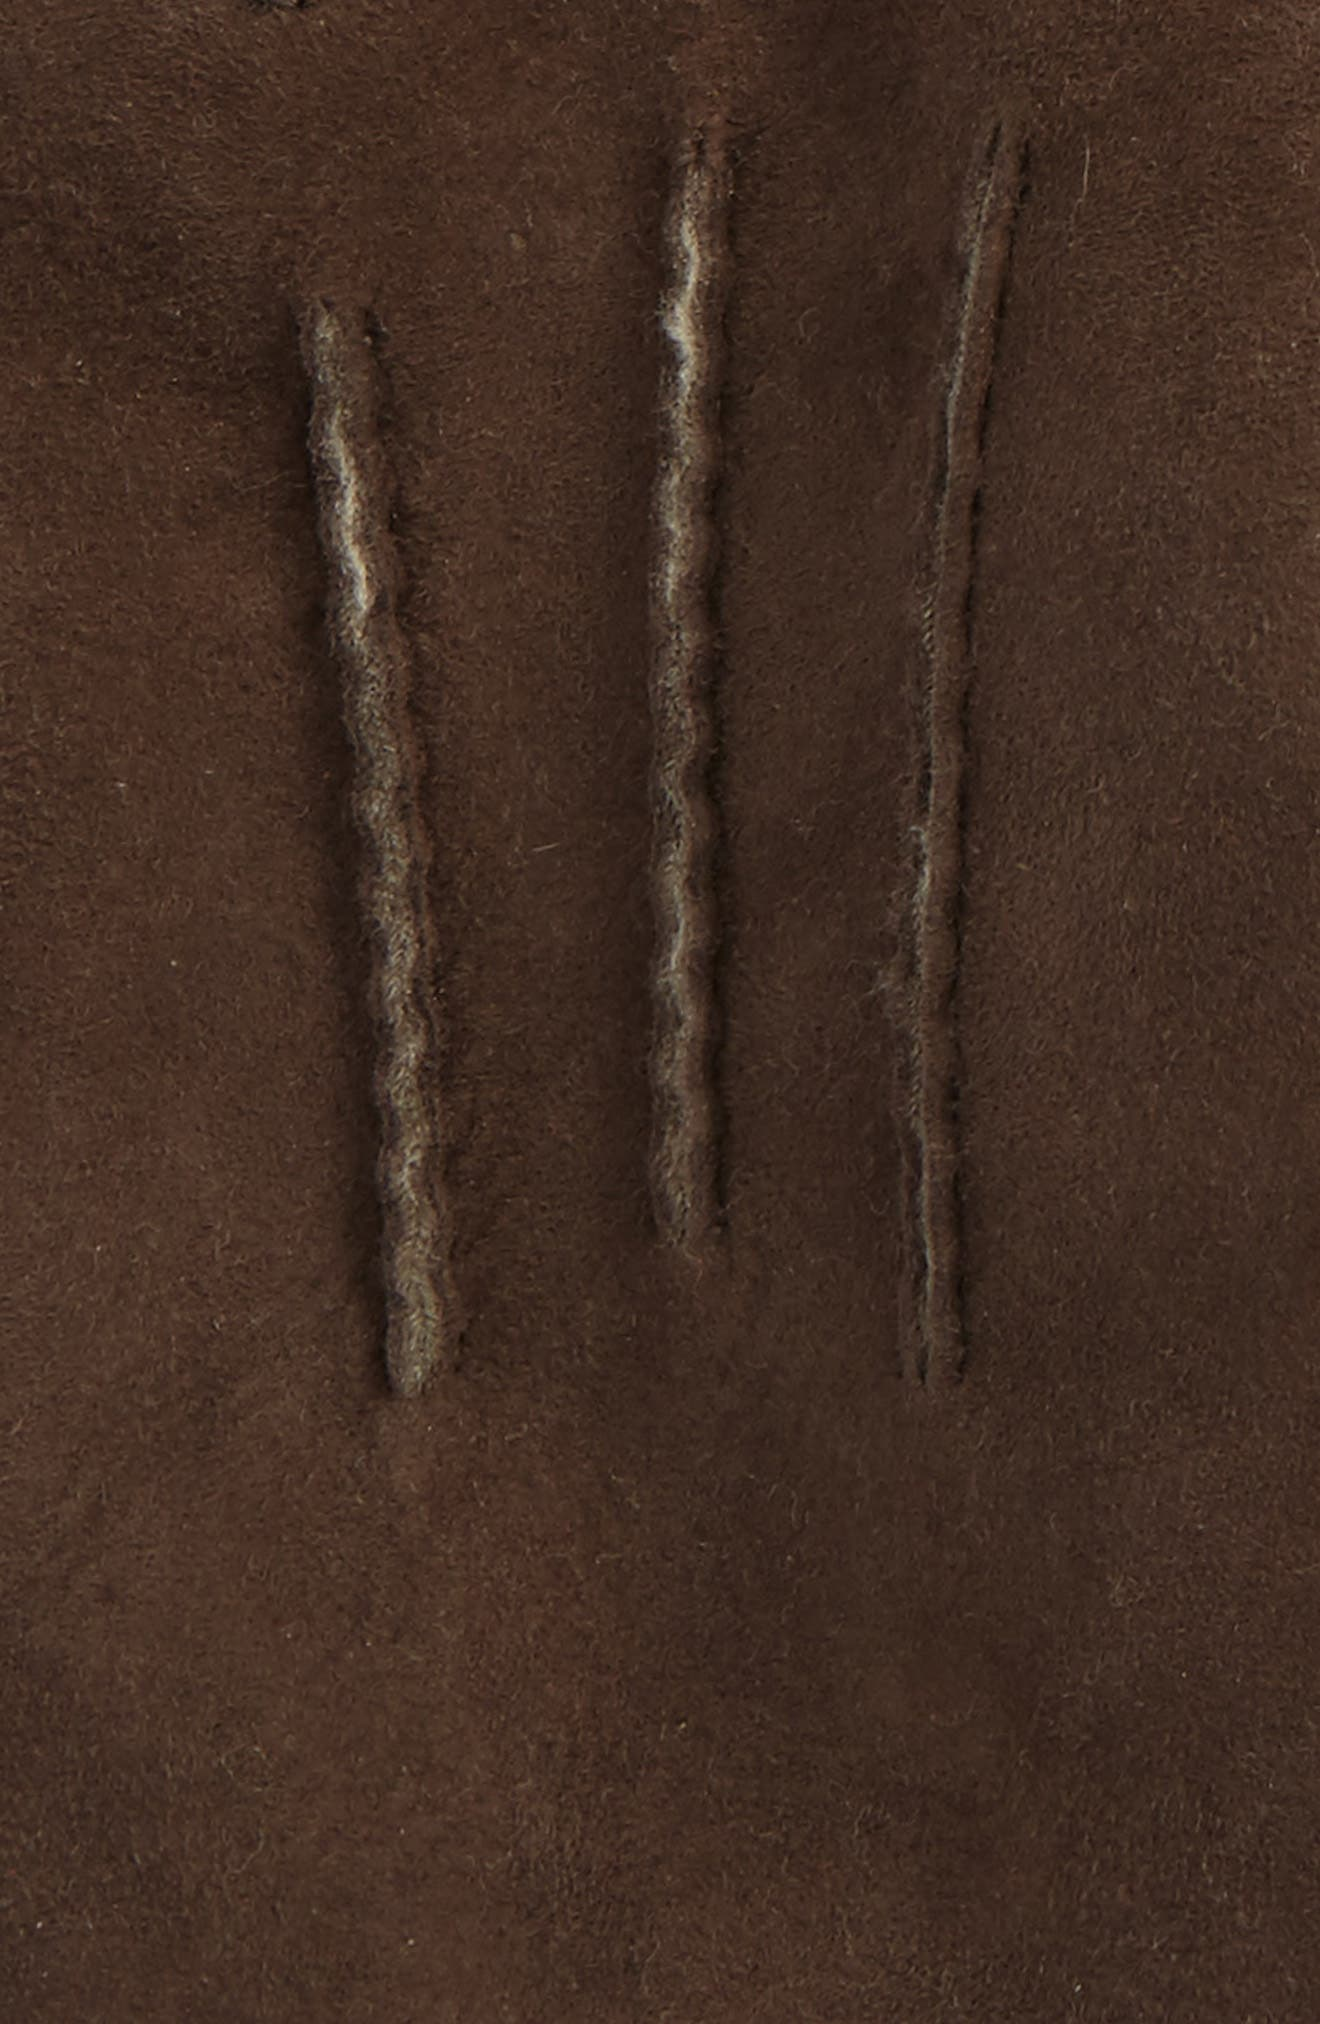 UGG Smart Sheepskin Shearling Leather Gloves,                             Alternate thumbnail 2, color,                             Slate Curly